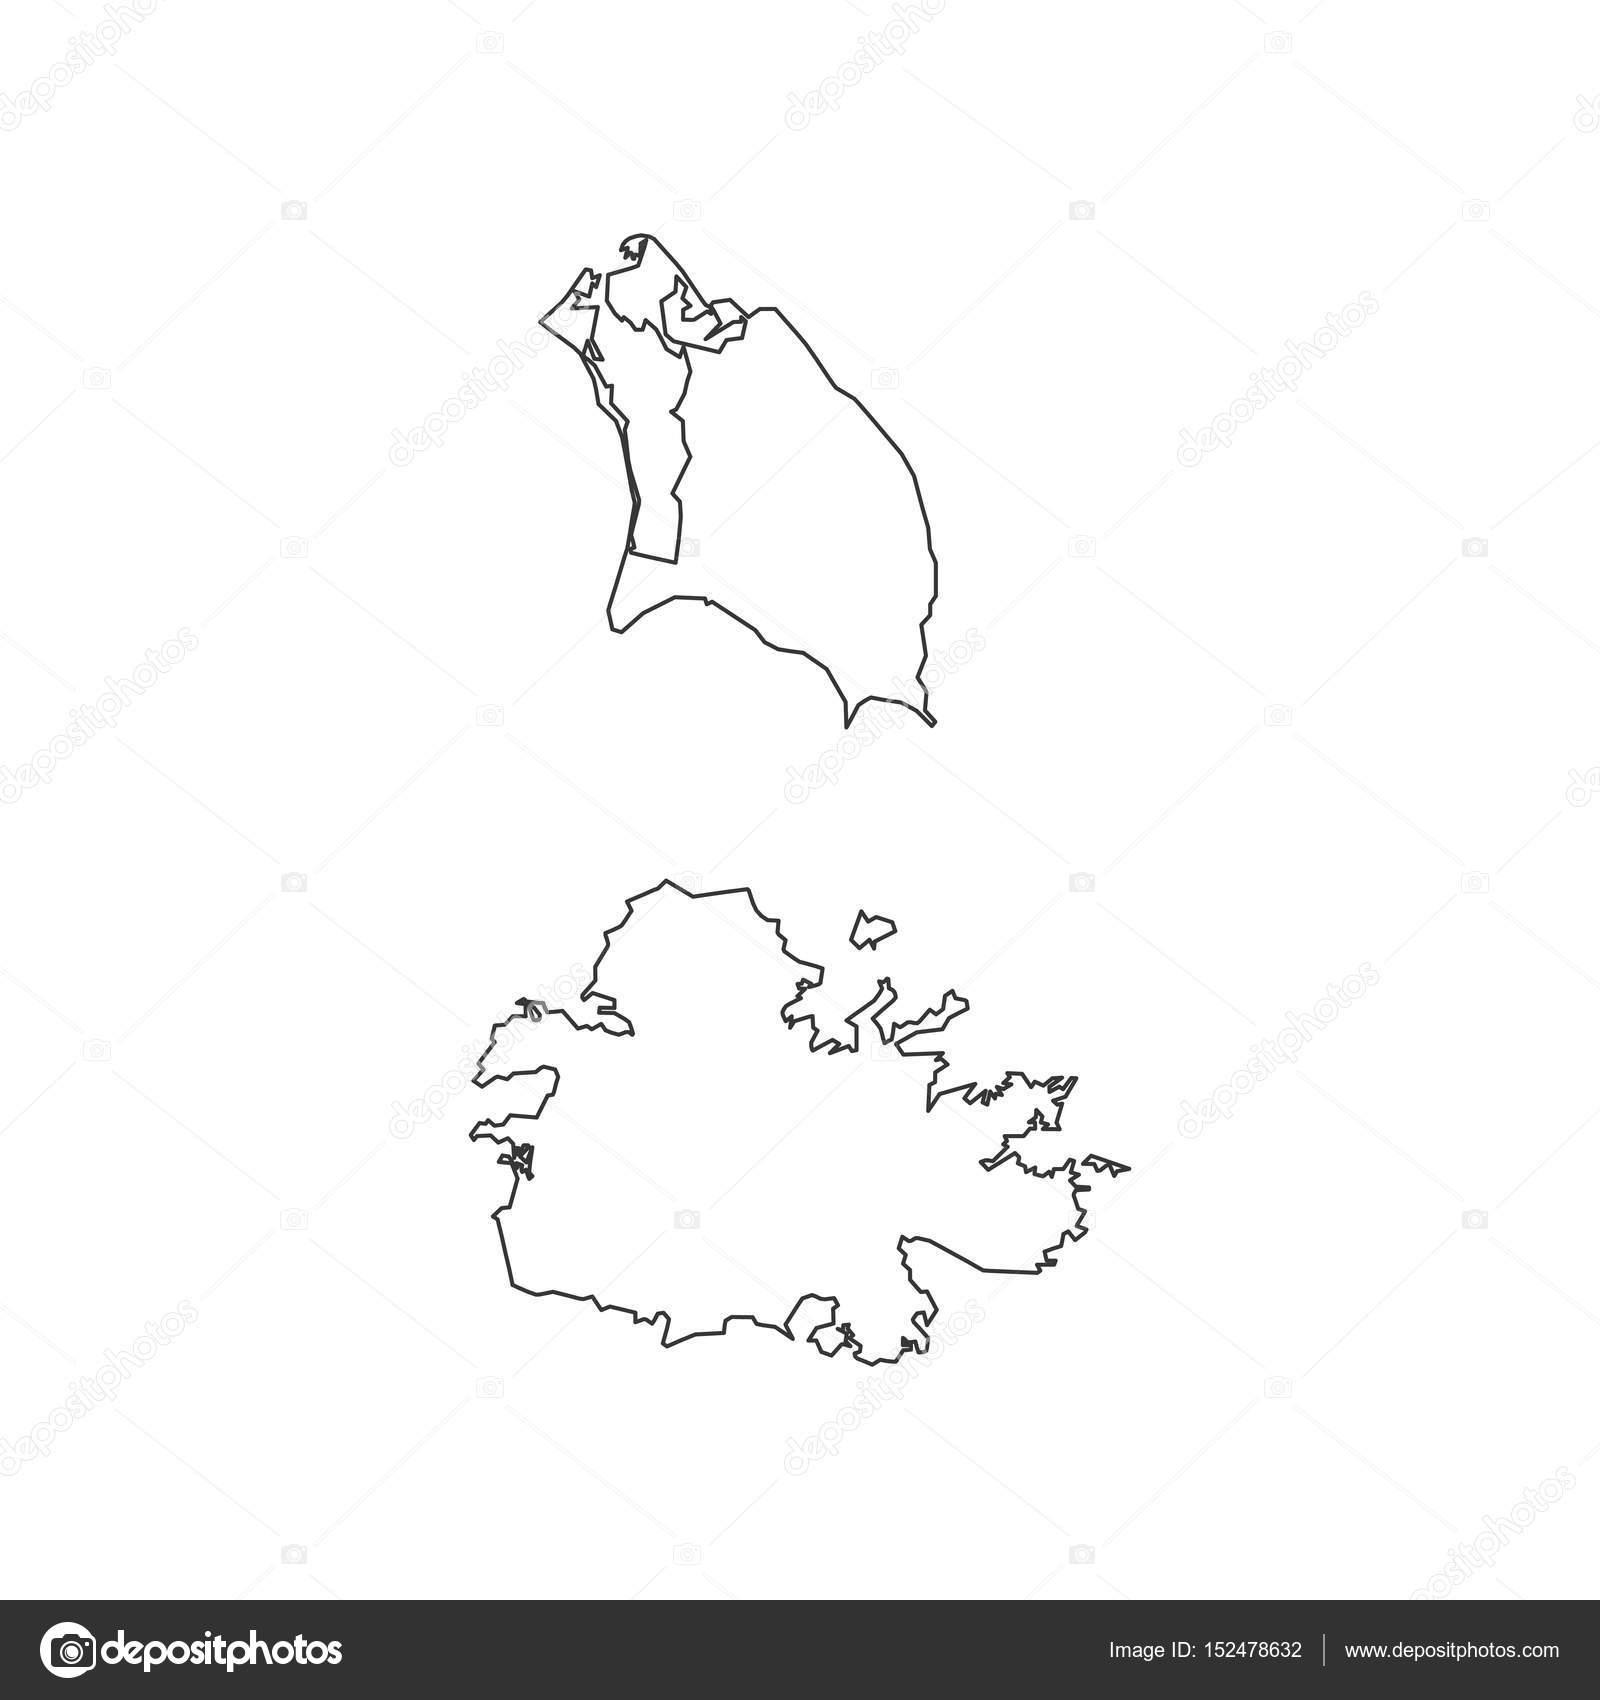 Antigua and Barbuda map — Stock Vector © parkheta.gmail.com #152478632